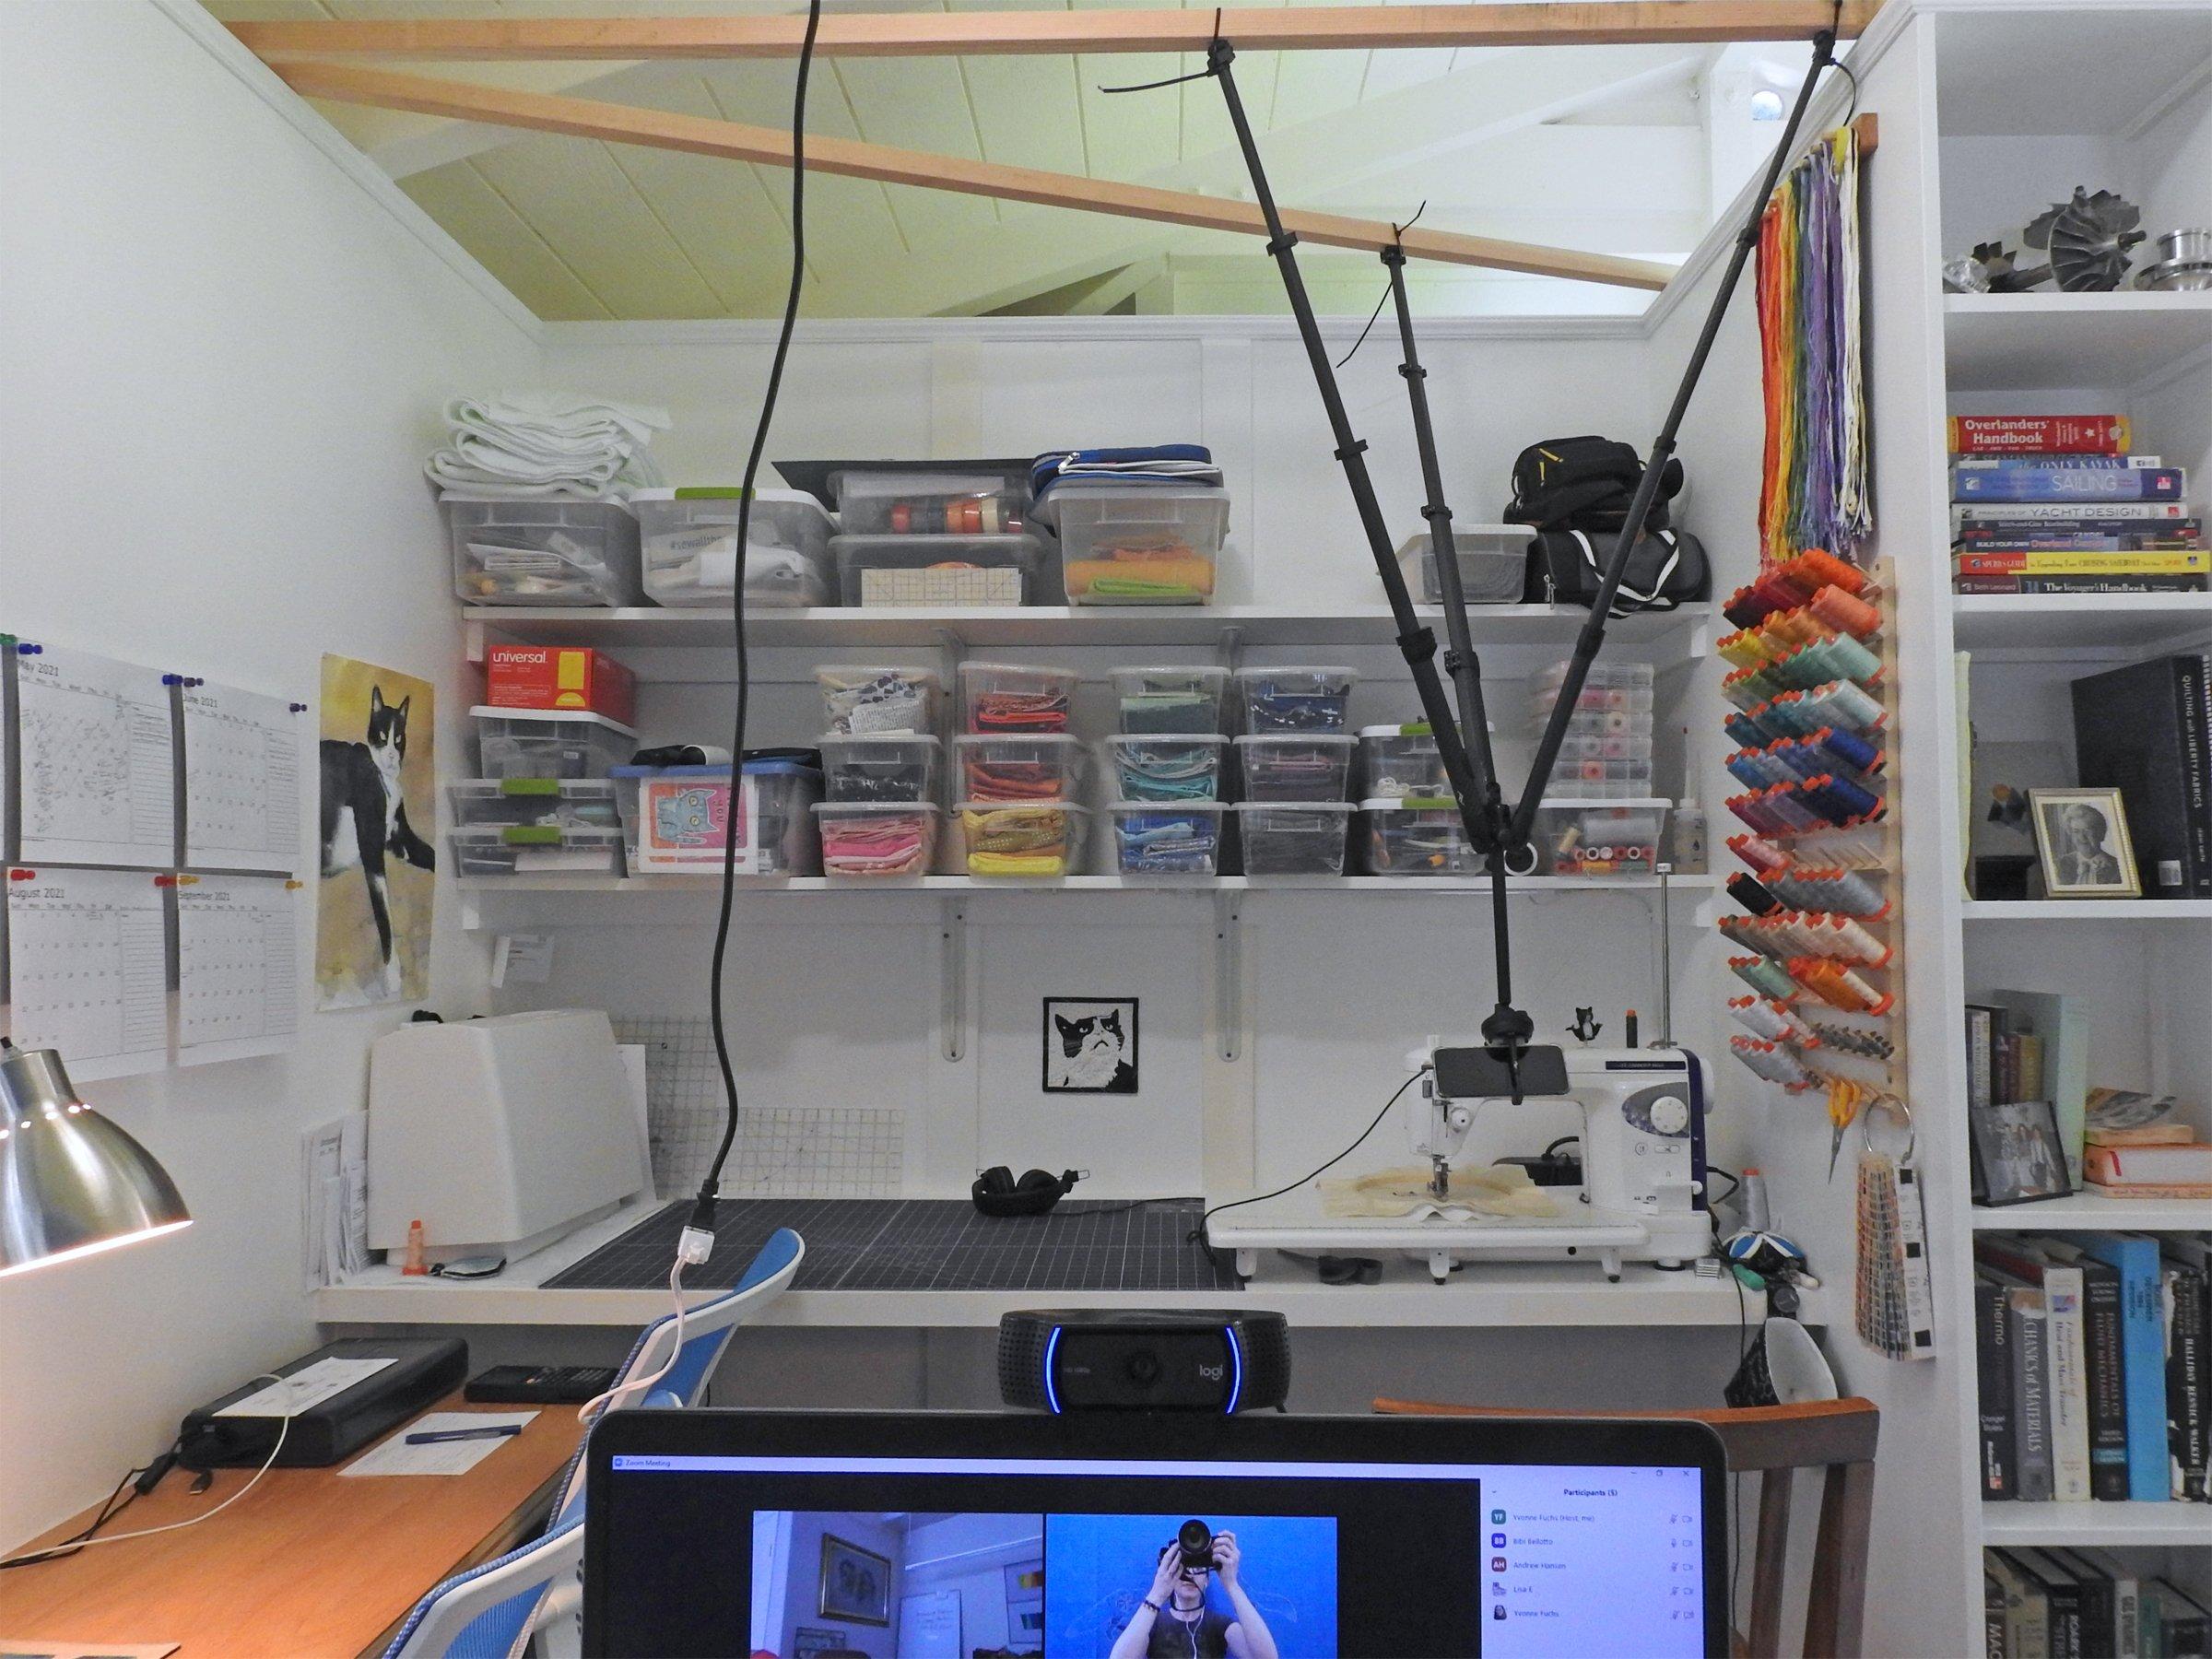 Behind the Scenes - Sewing Machine Demo Setup